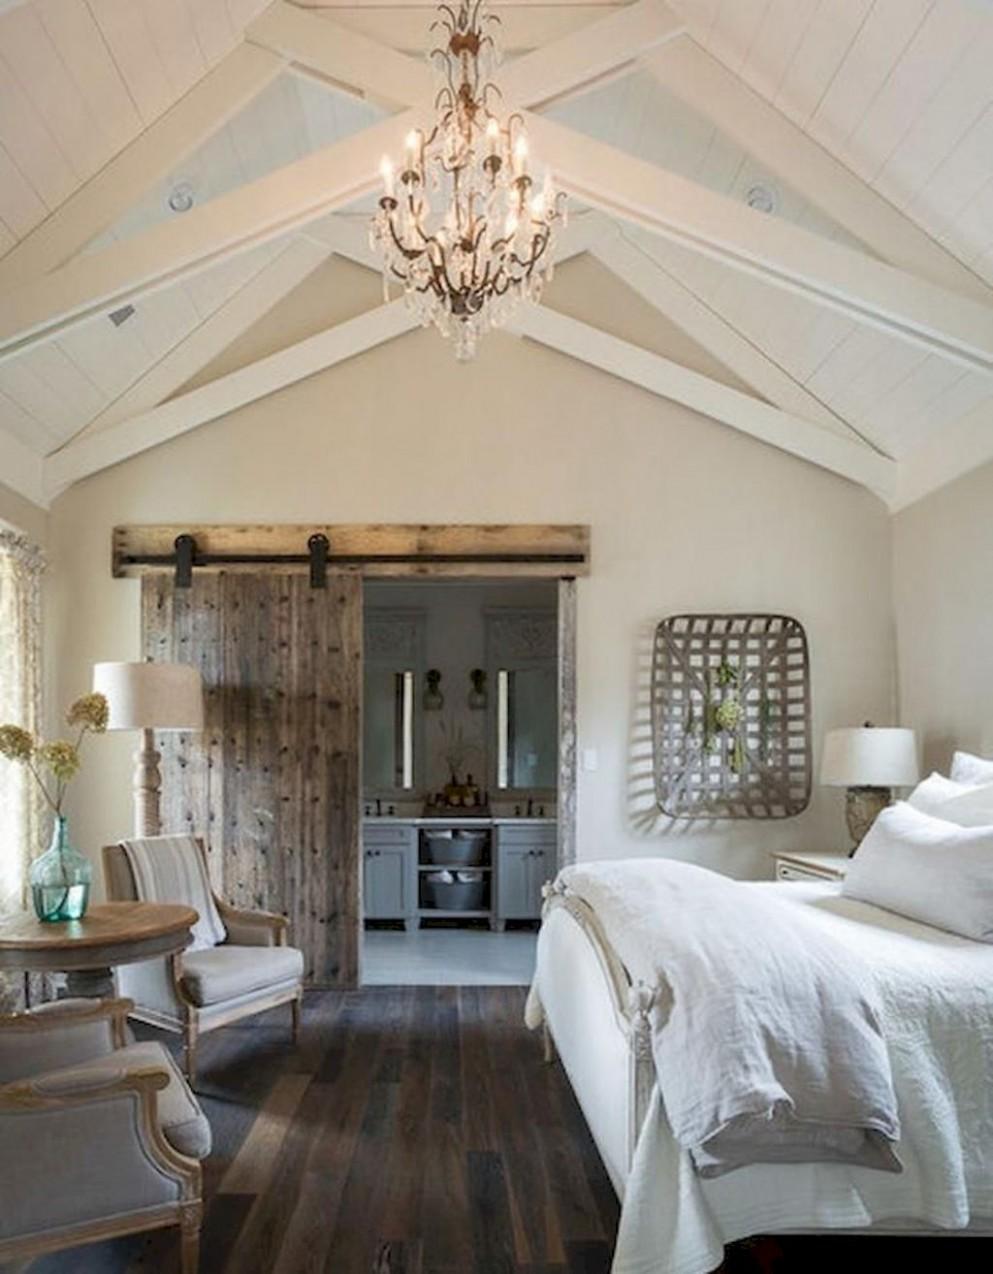 12 Rustic Master Bedroom for Farmhouse Ideas  Farmhouse style  - Bedroom Ideas Rustic